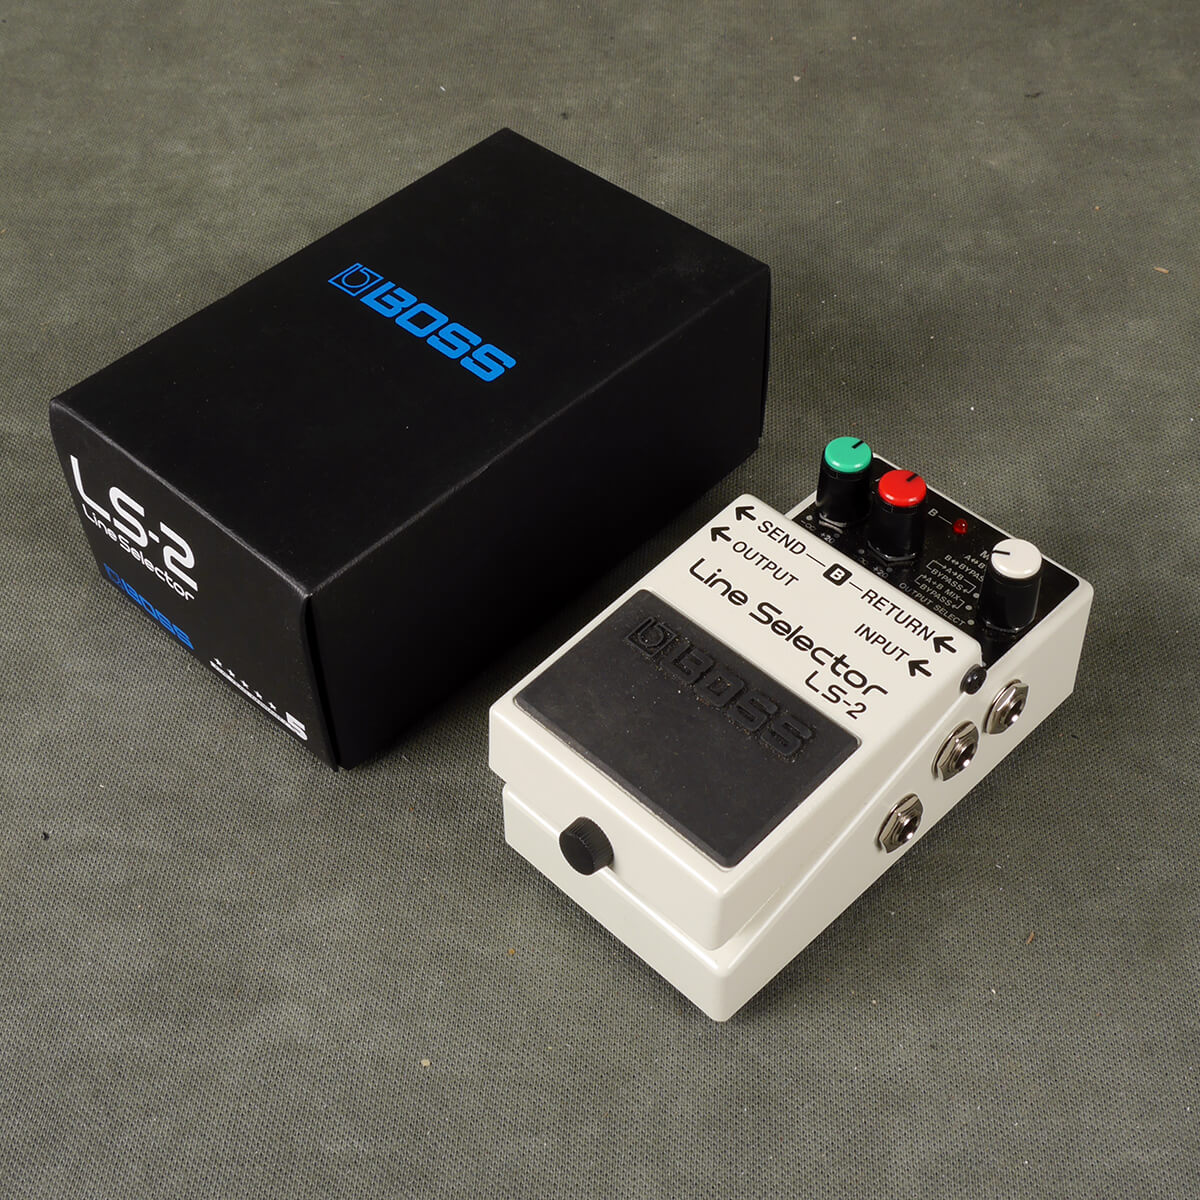 Boss LS-2 Line Selector FX Pedal w/Box - 2nd Hand